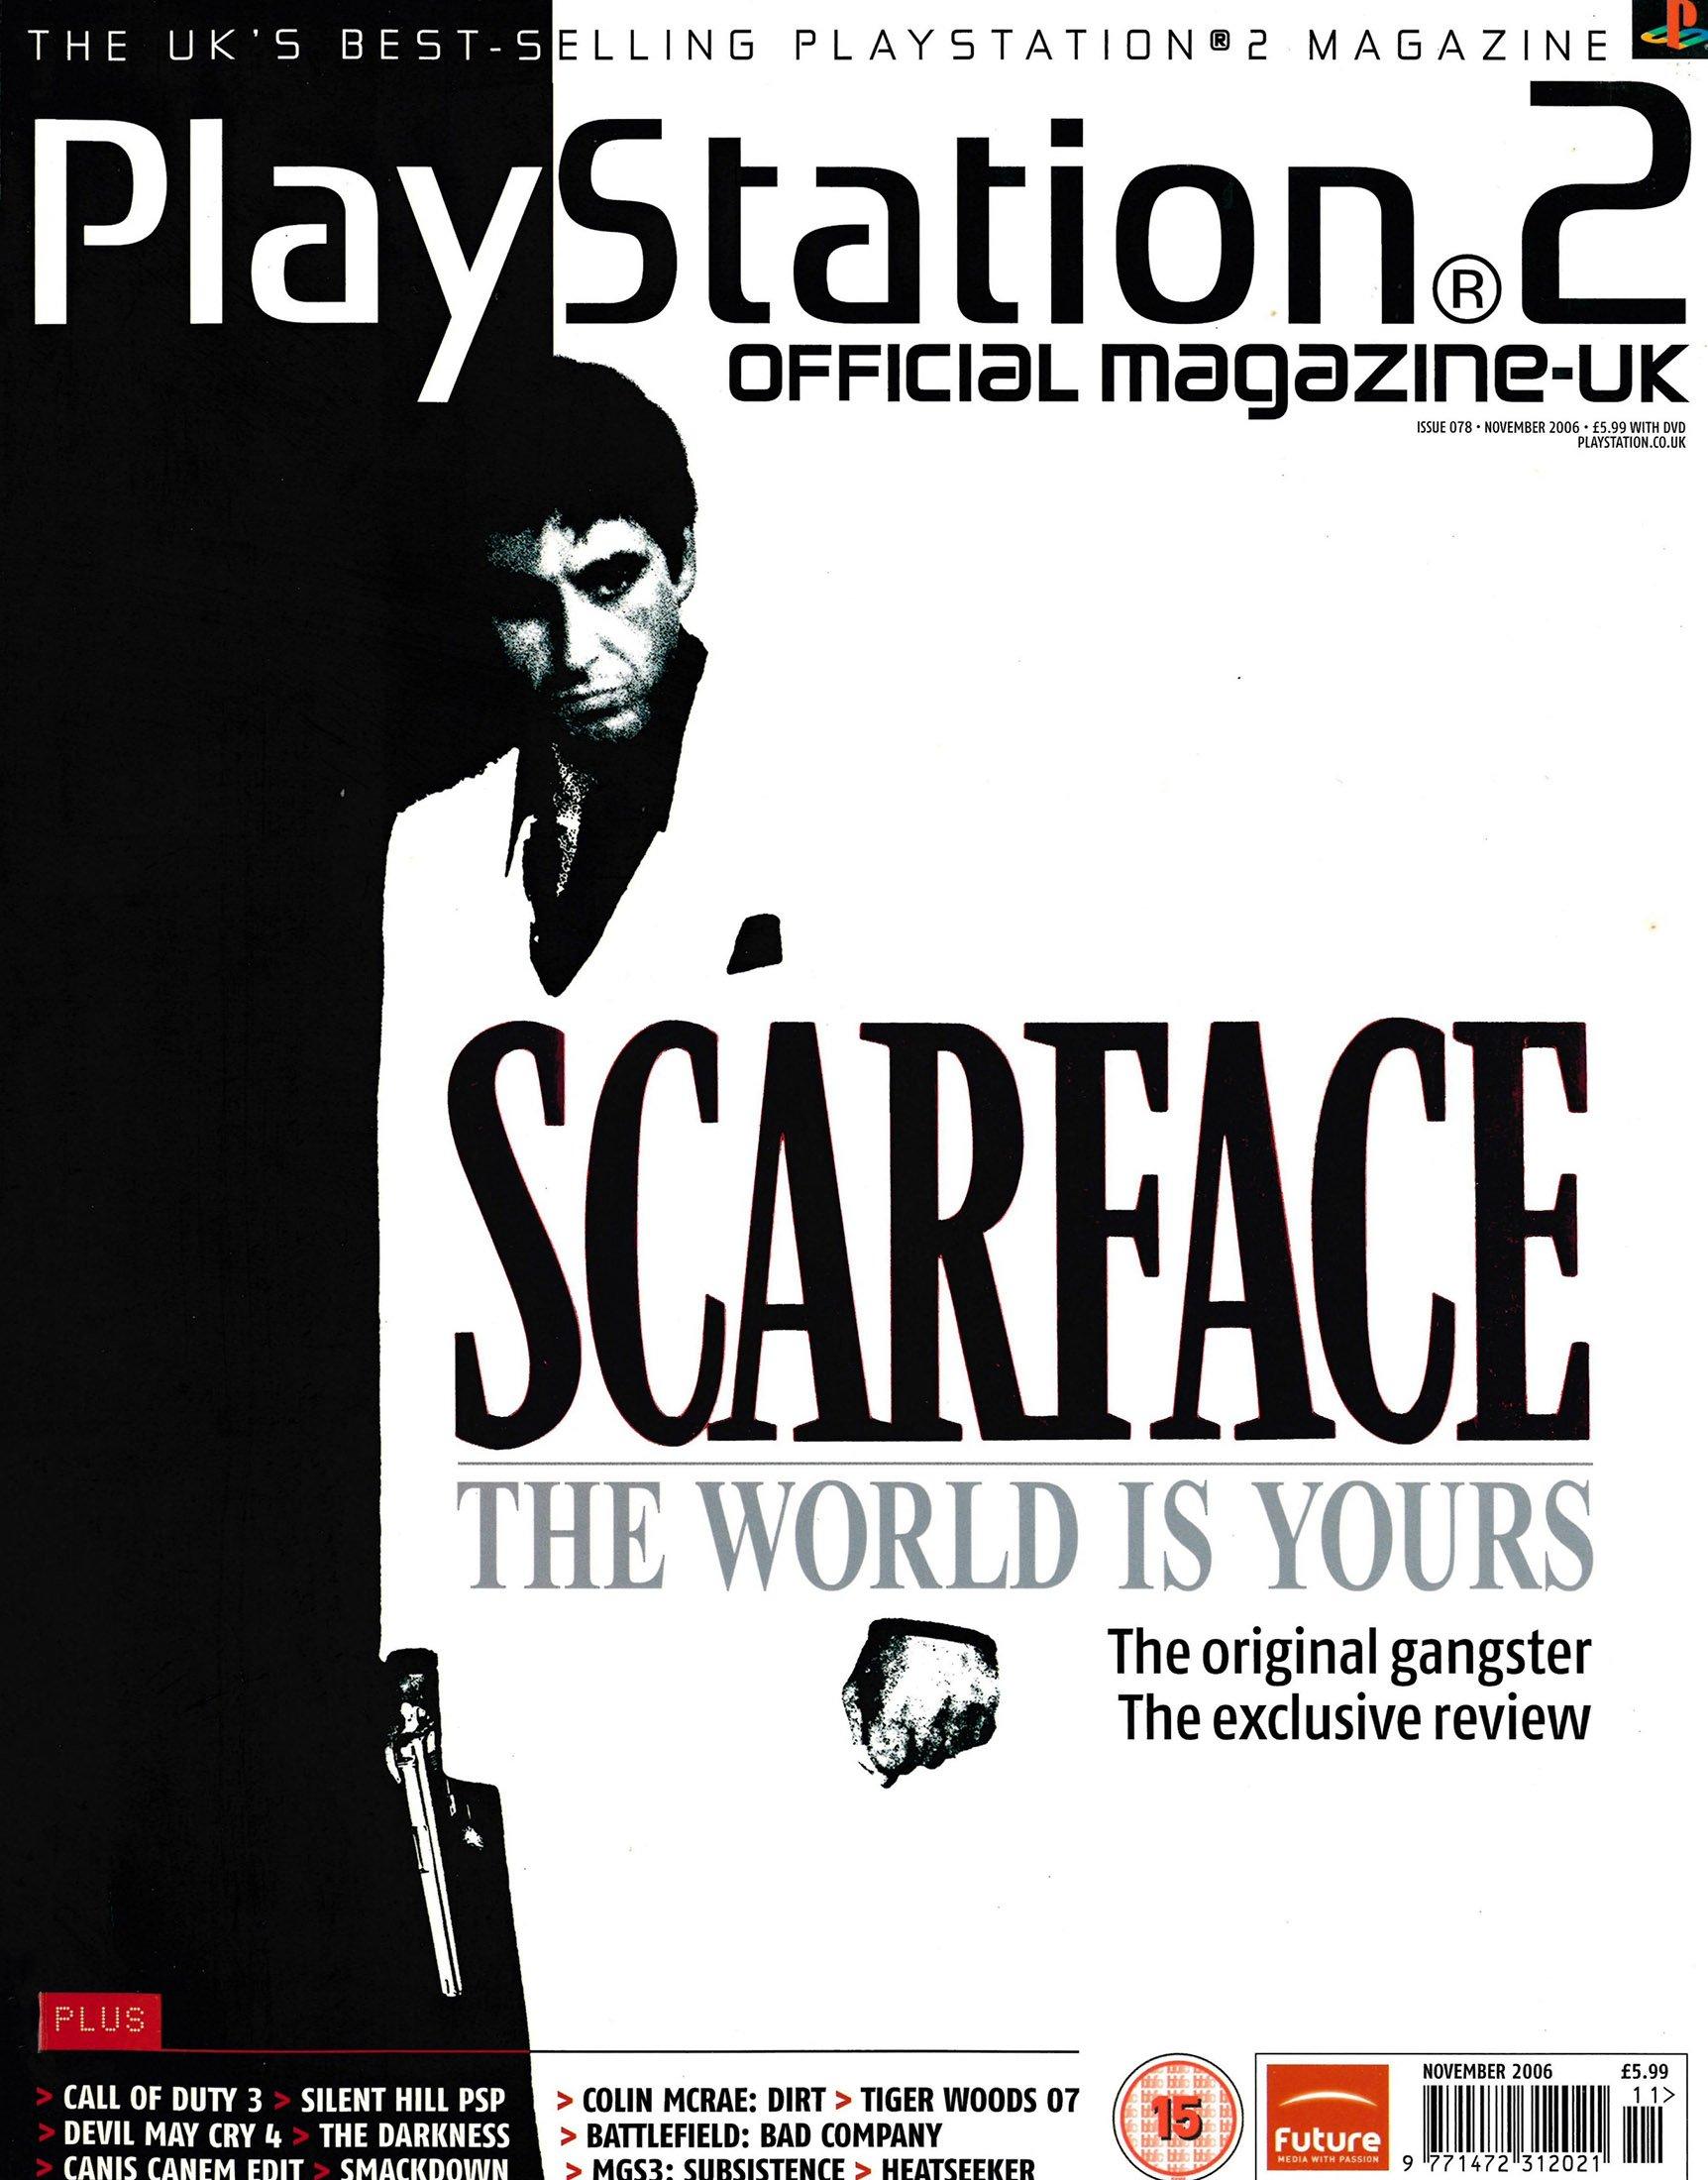 Official Playstation 2 Magazine UK 078 (November 2006)